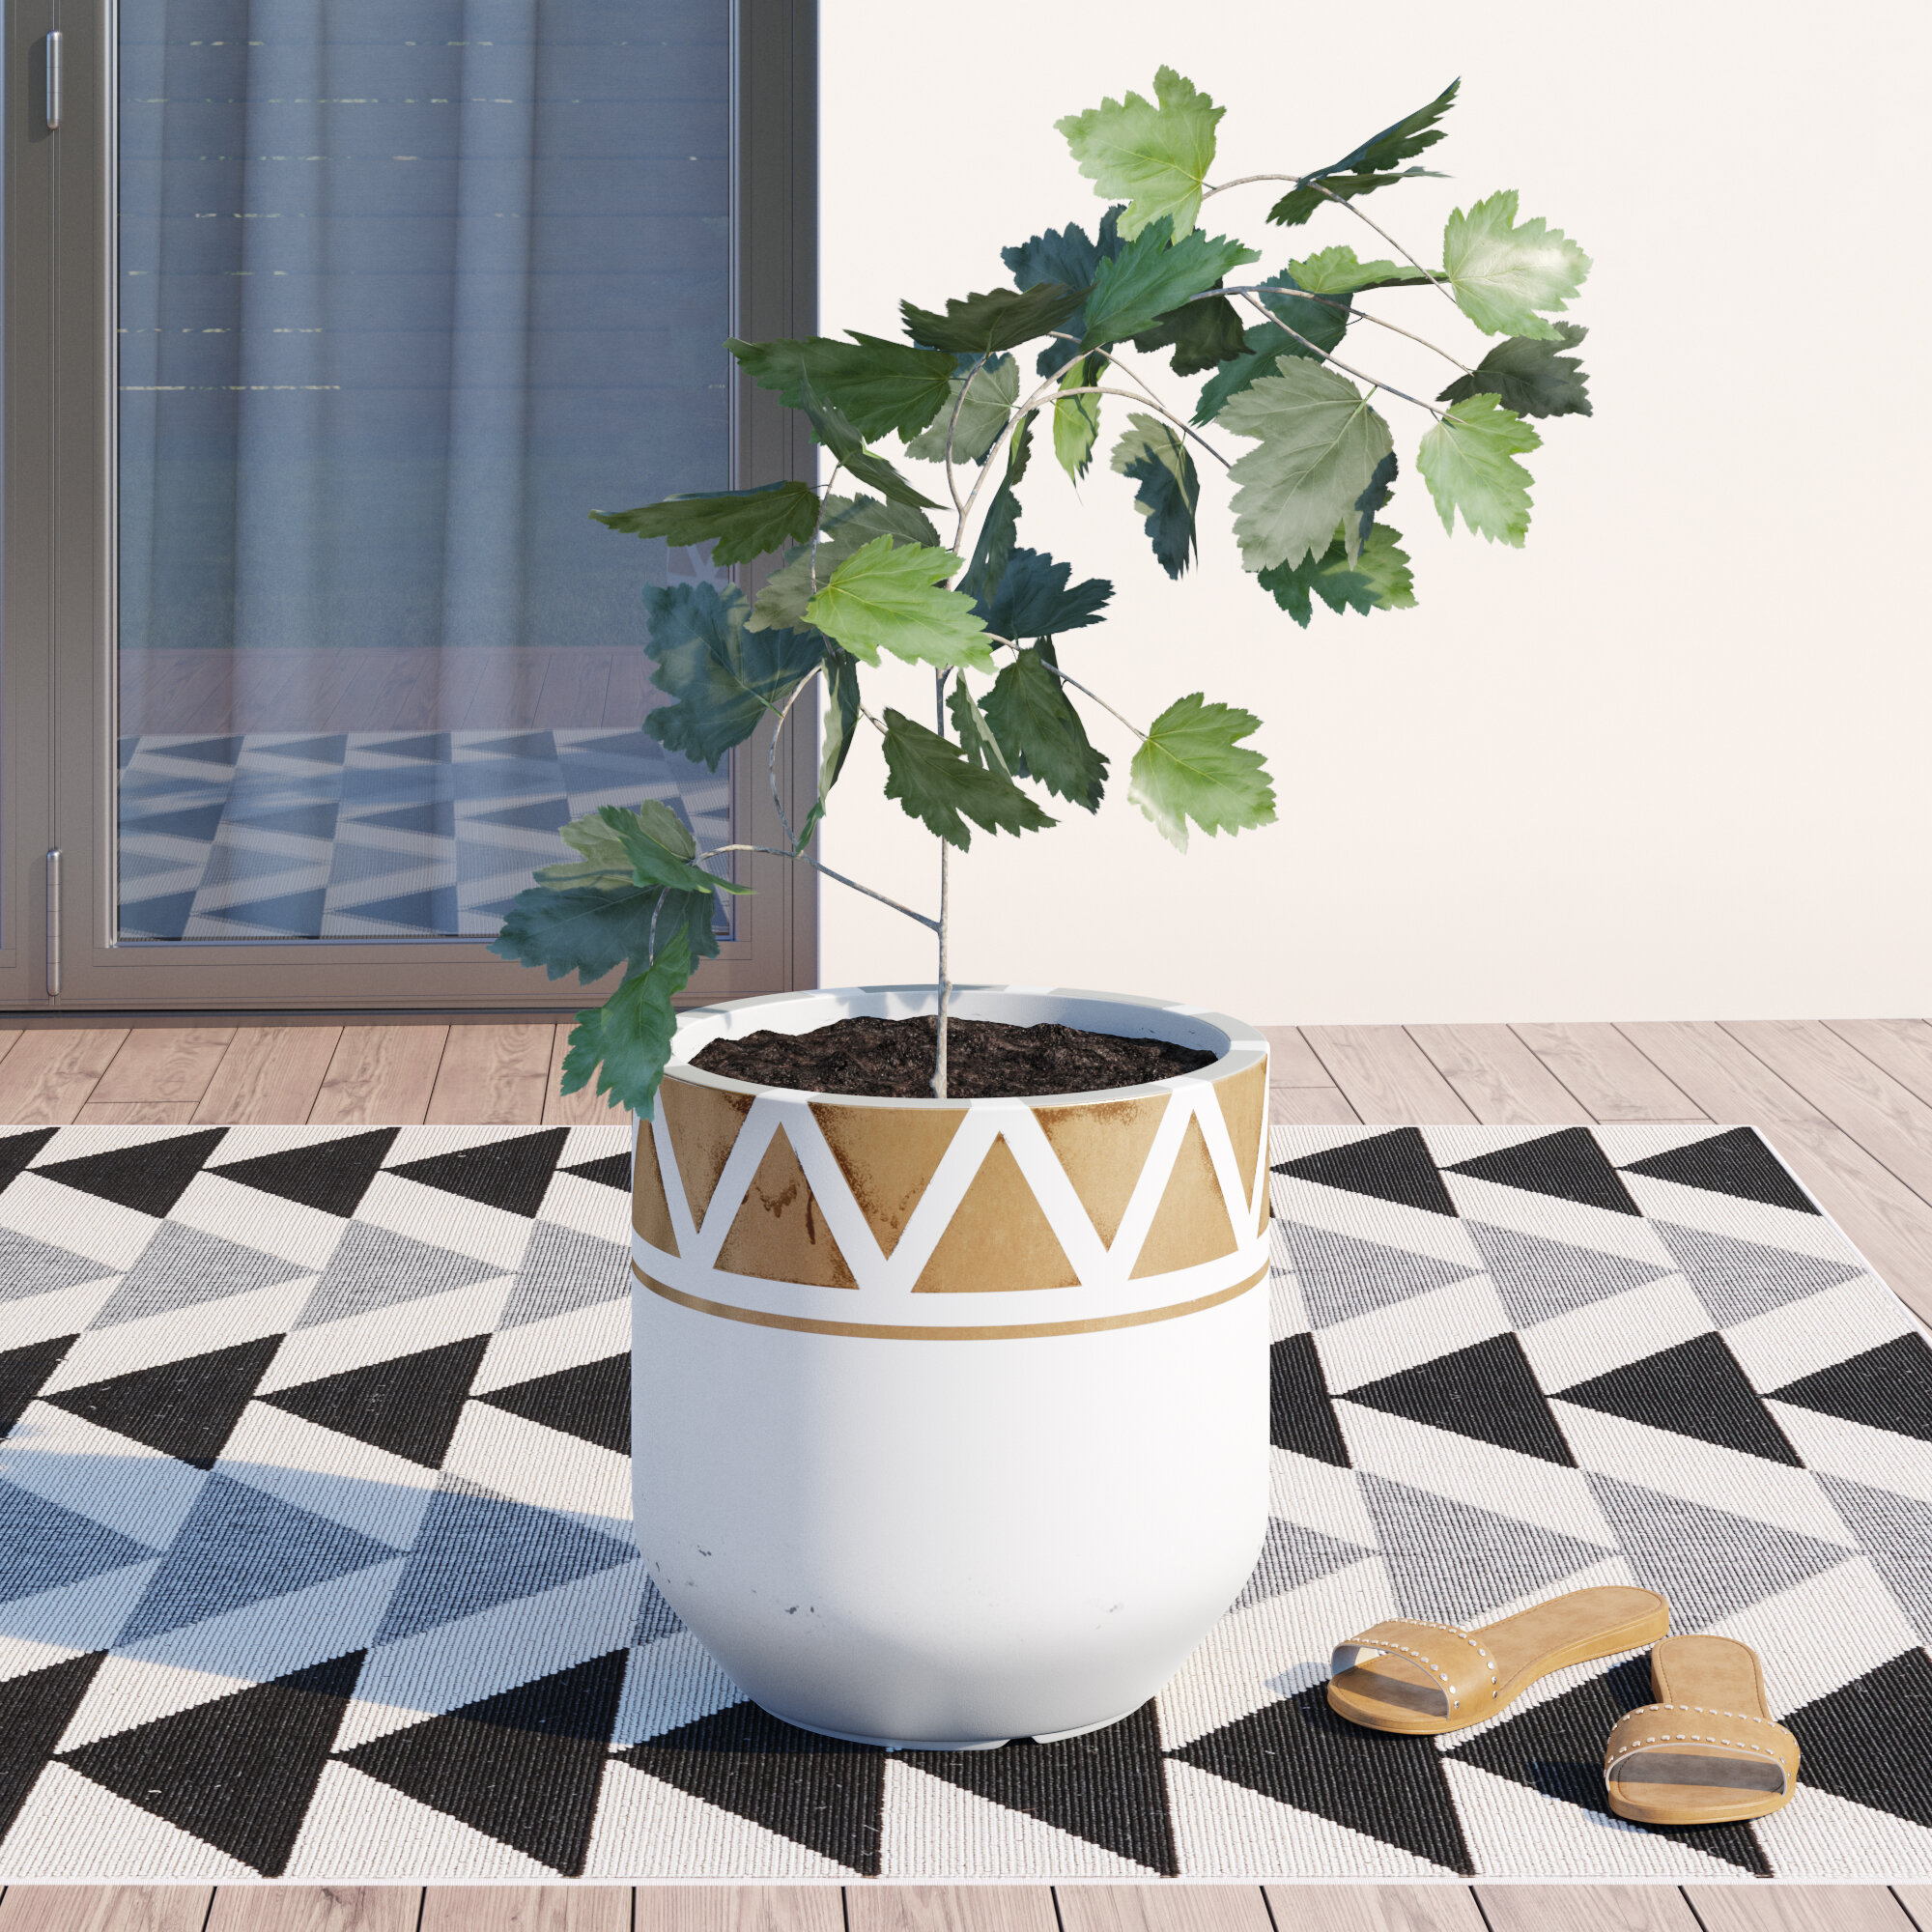 Bellavia Handcrafted Fiber Clay Pot Planter Reviews Allmodern